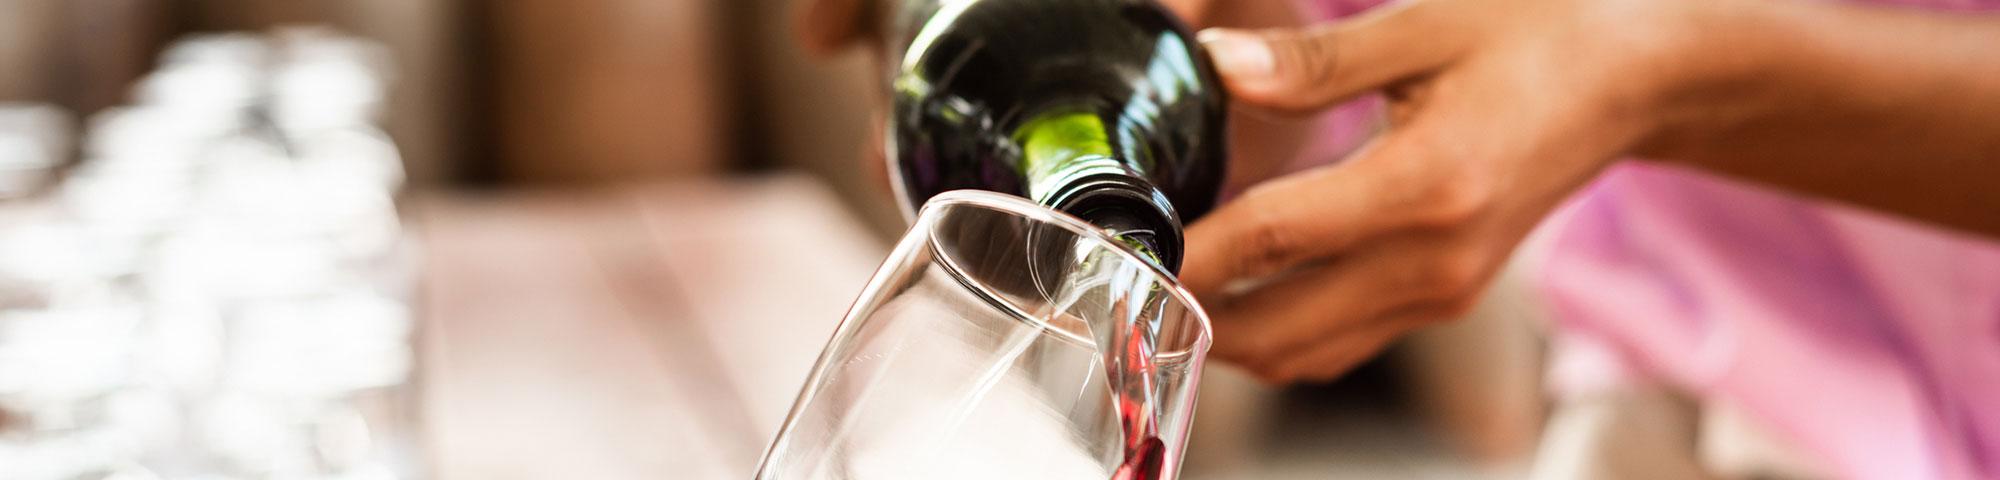 Bodegas vitivinícolas